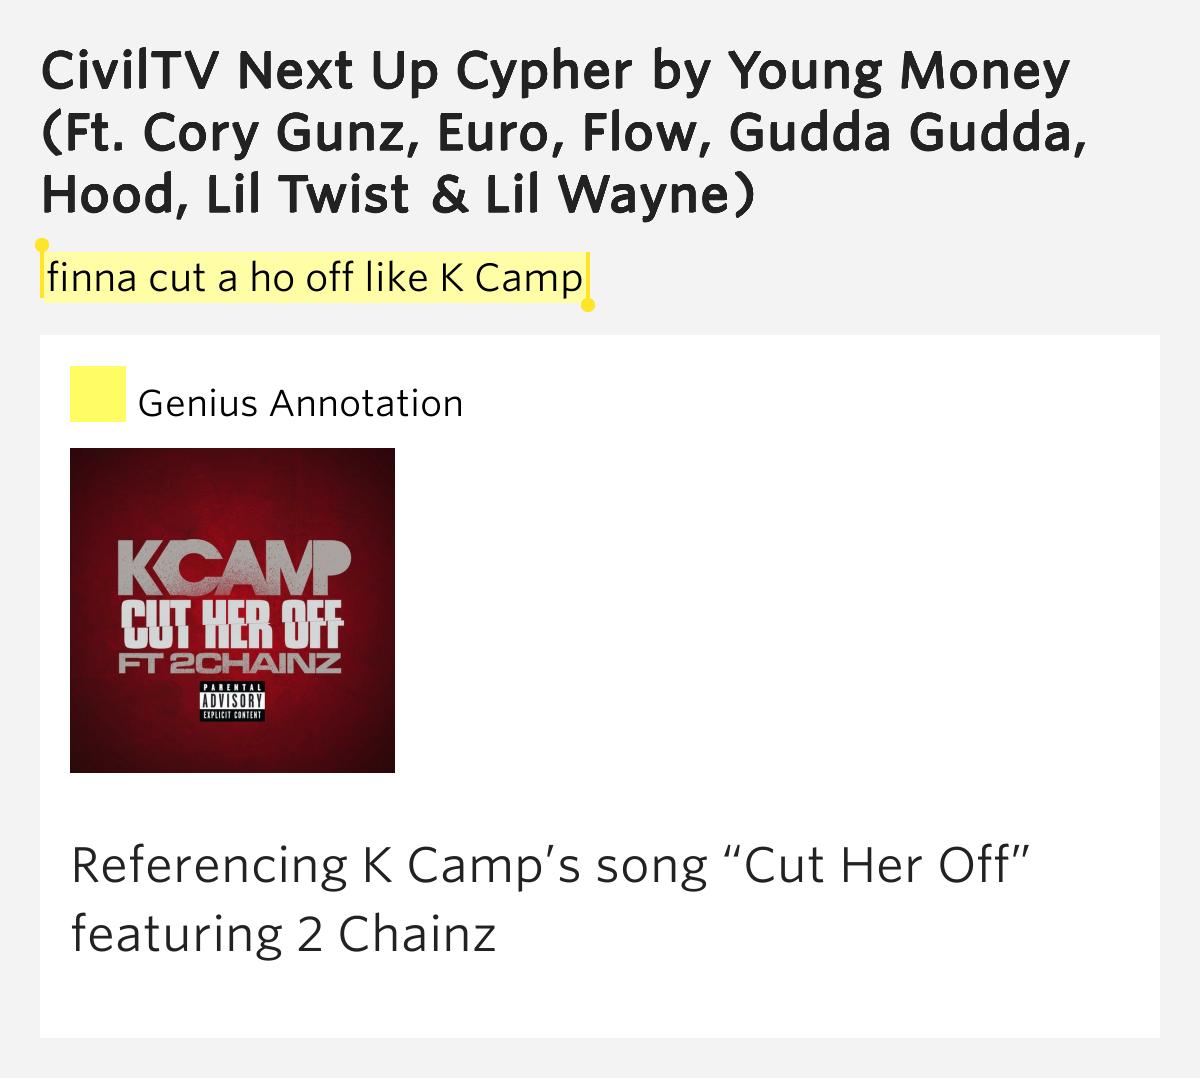 K Camp Cut Her Off Lyrics Finna cut a ho off lik...